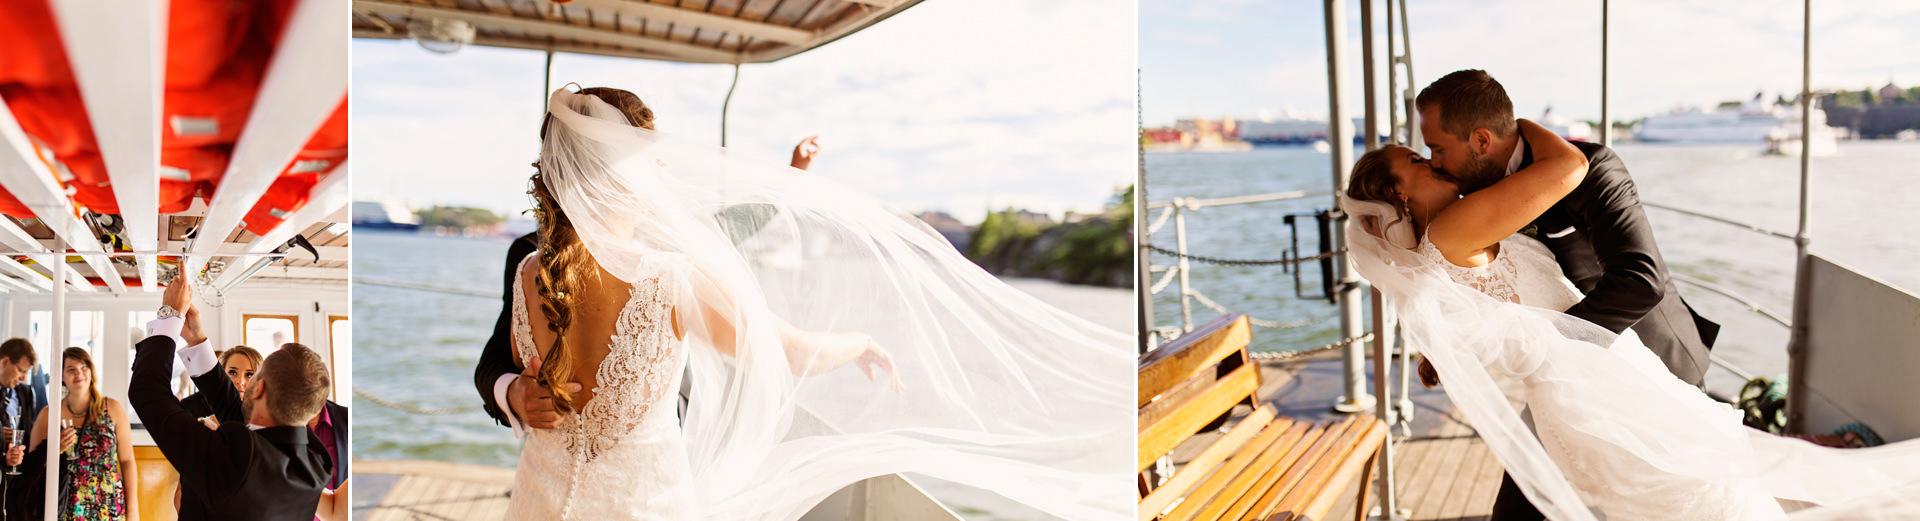 wedding-stockholm